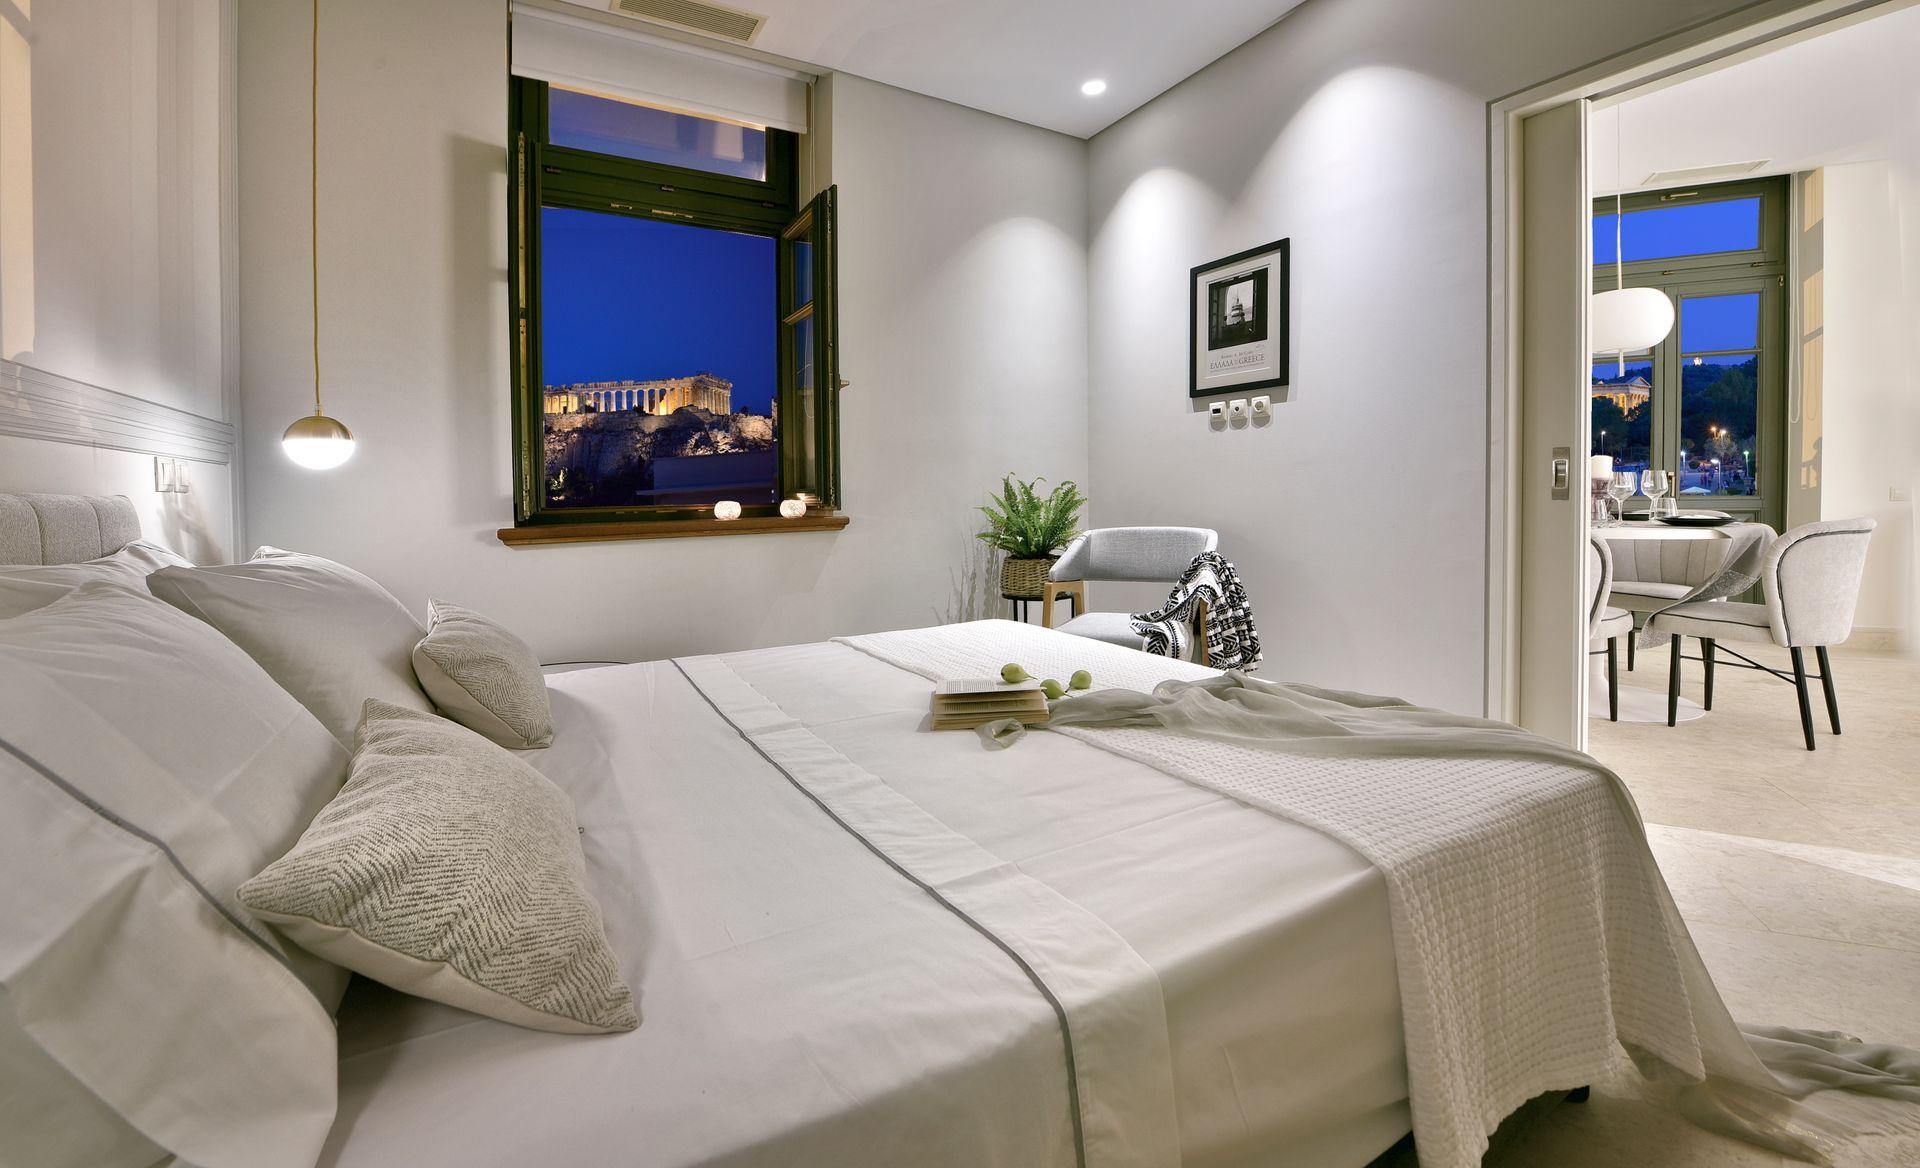 Thission Luxury Homes by K&K - Αθήνα ✦ 2 Ημέρες (1 Διανυκτέρευση) ✦ 2 άτομα ✦ Χωρίς Πρωινό ✦ έως 31/03/2022 ✦ Στο κέντρο της πόλης!